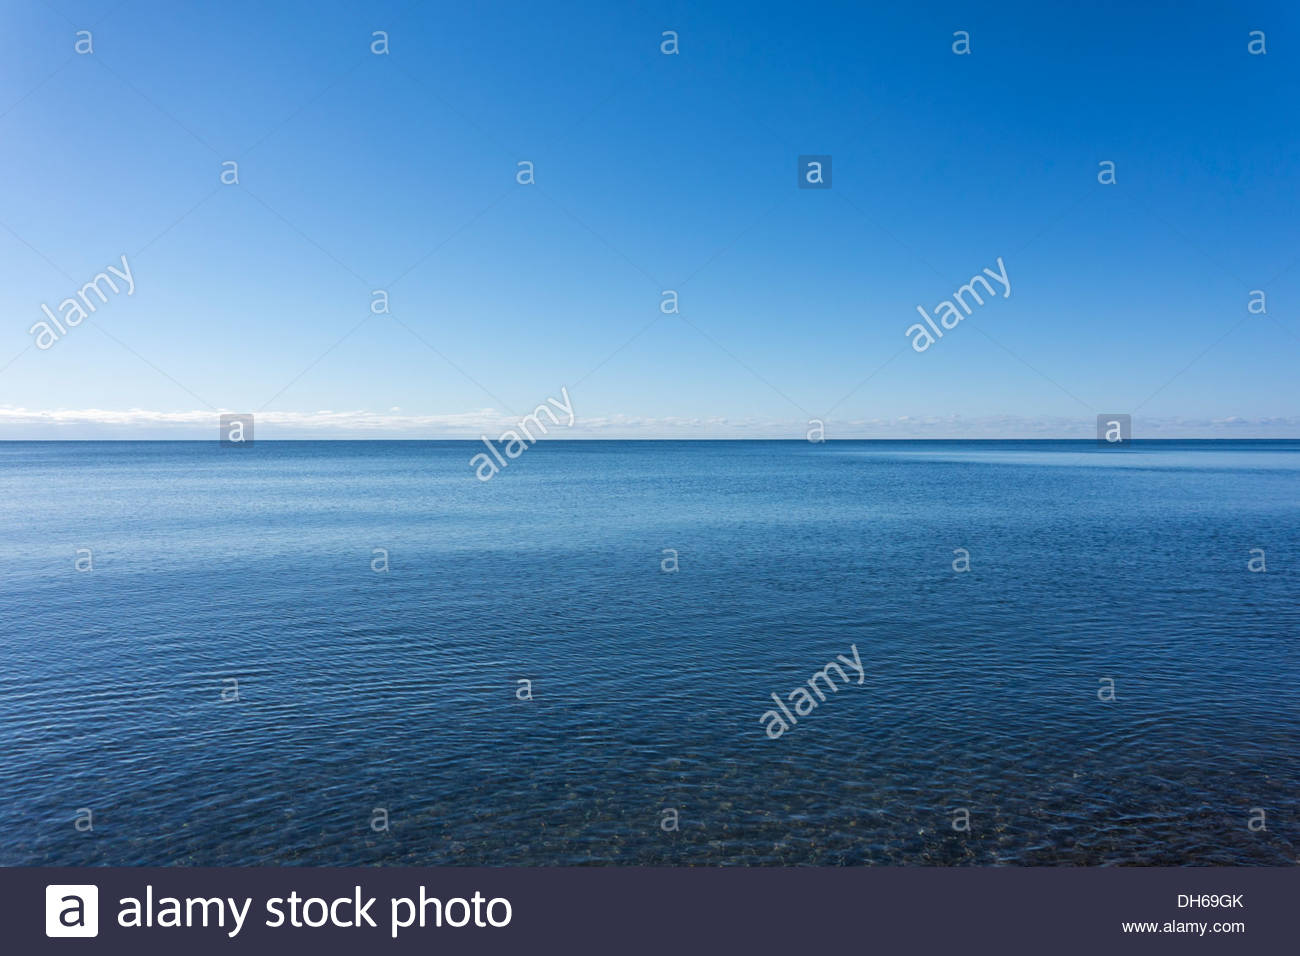 Vast empty infinite horizon of immense Lake Ontario, one of the Great Lakes, at Rouge Beach in Toronto Ontario Canada - Stock Image